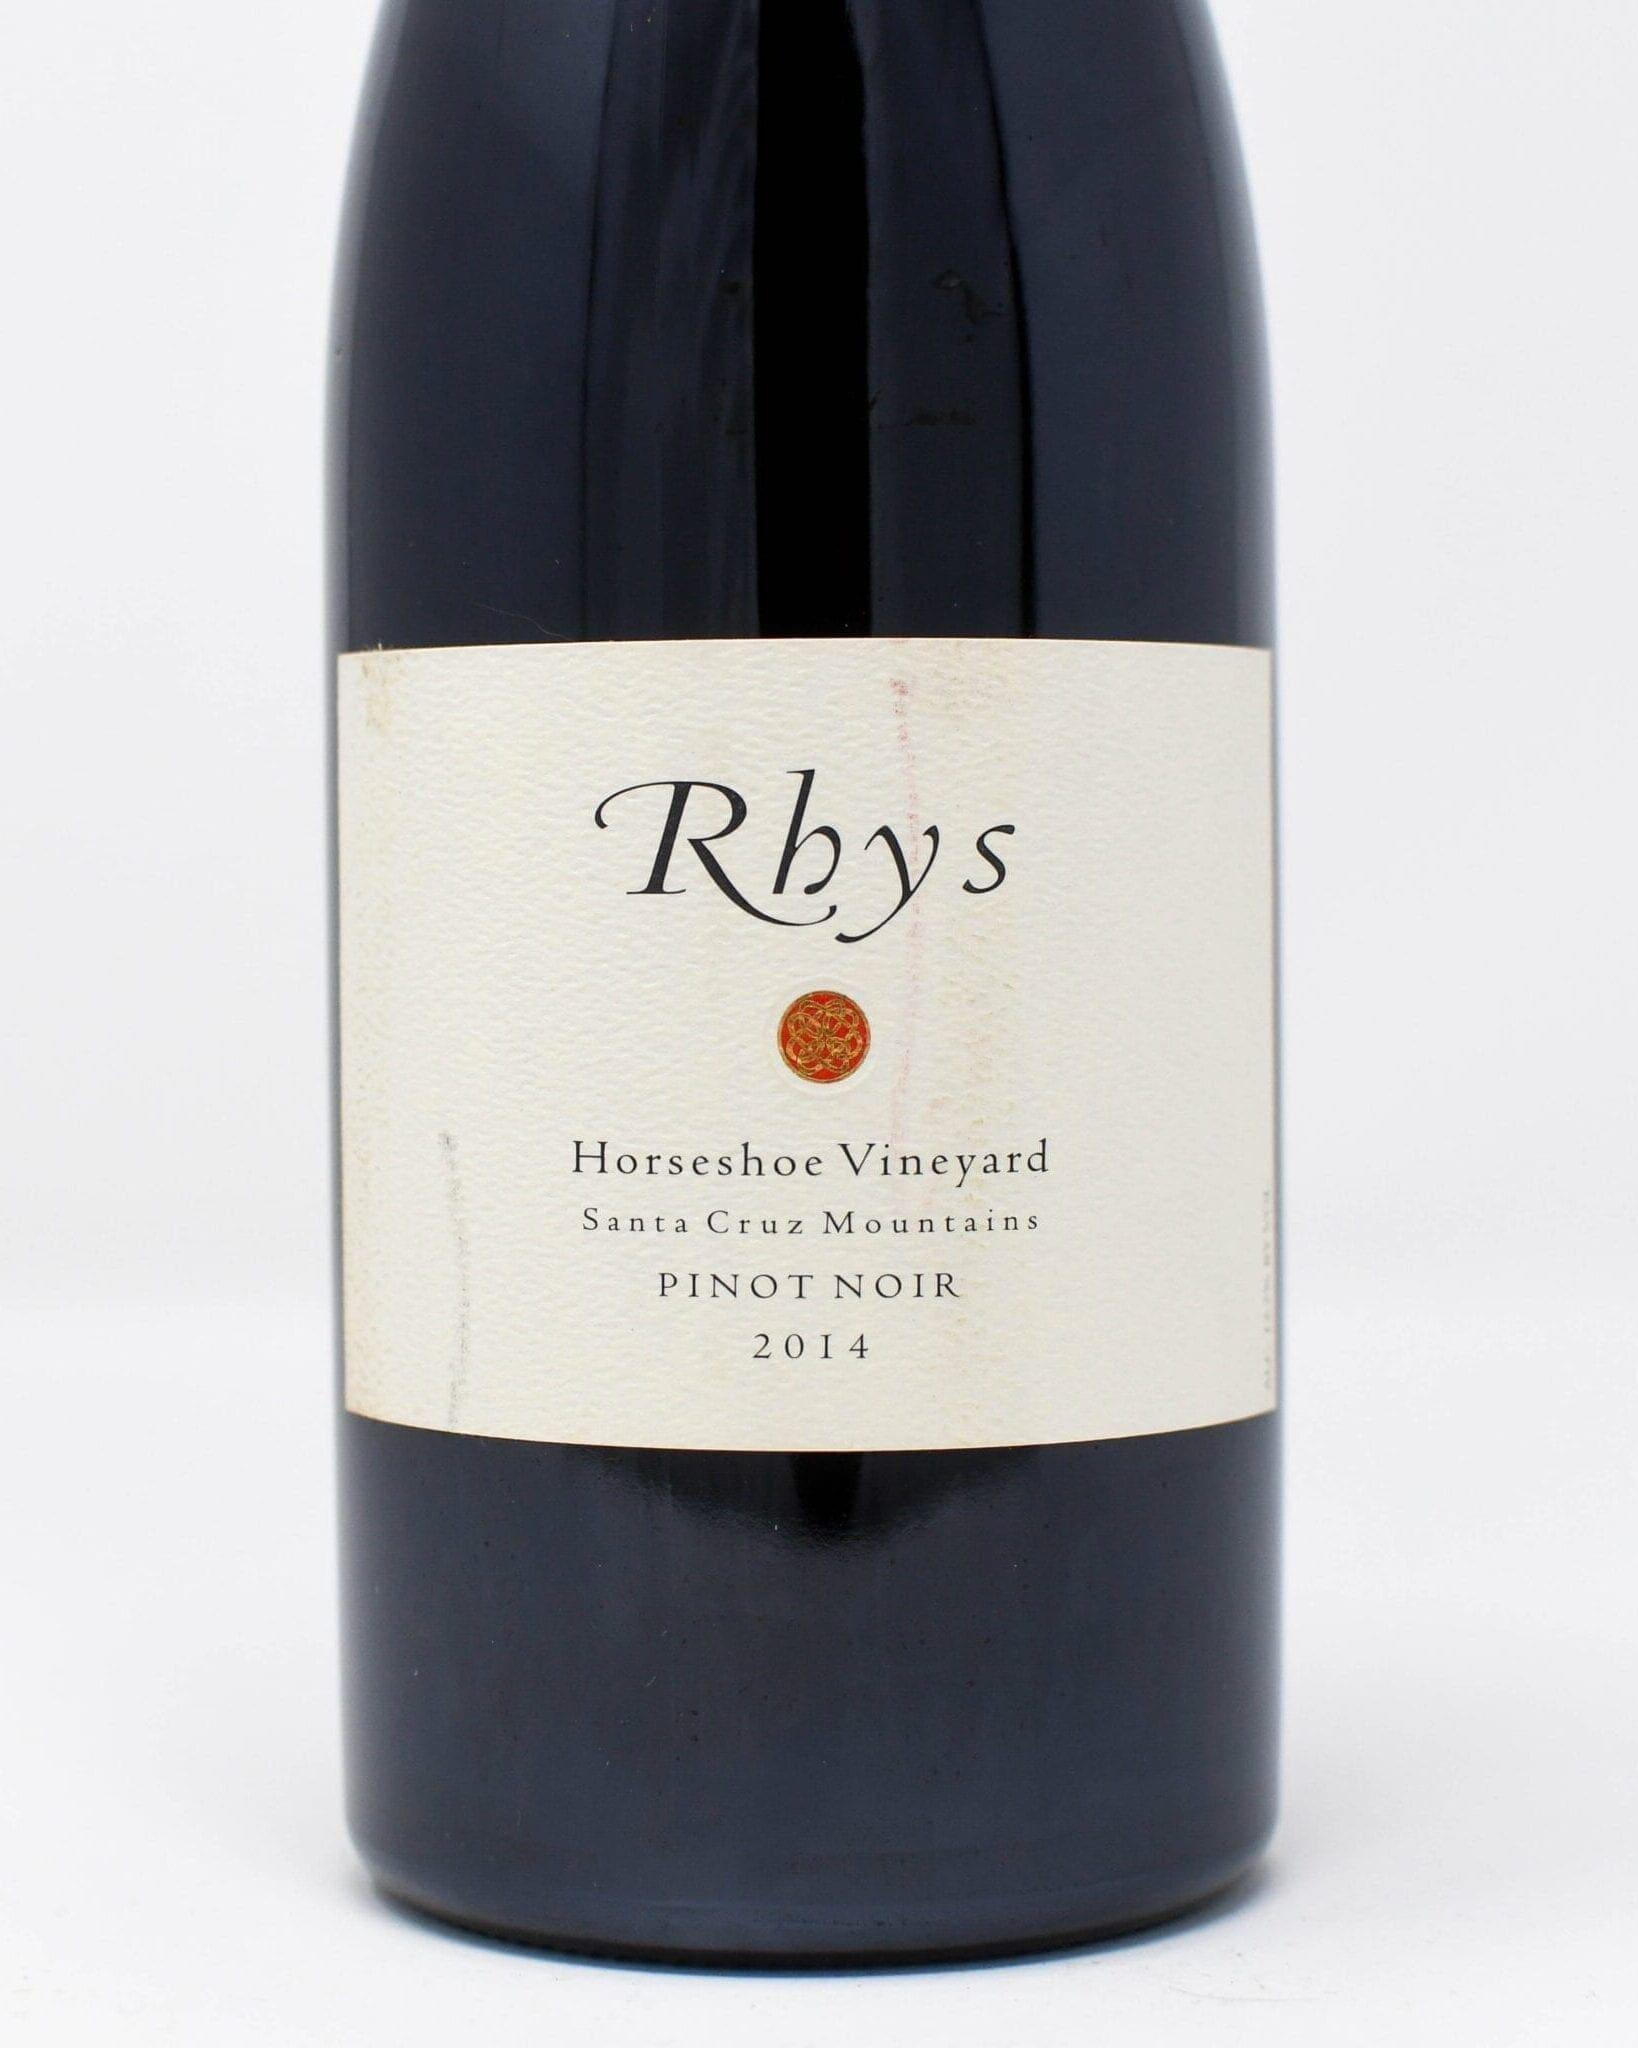 Rhys Horseshoe Pinot Noir